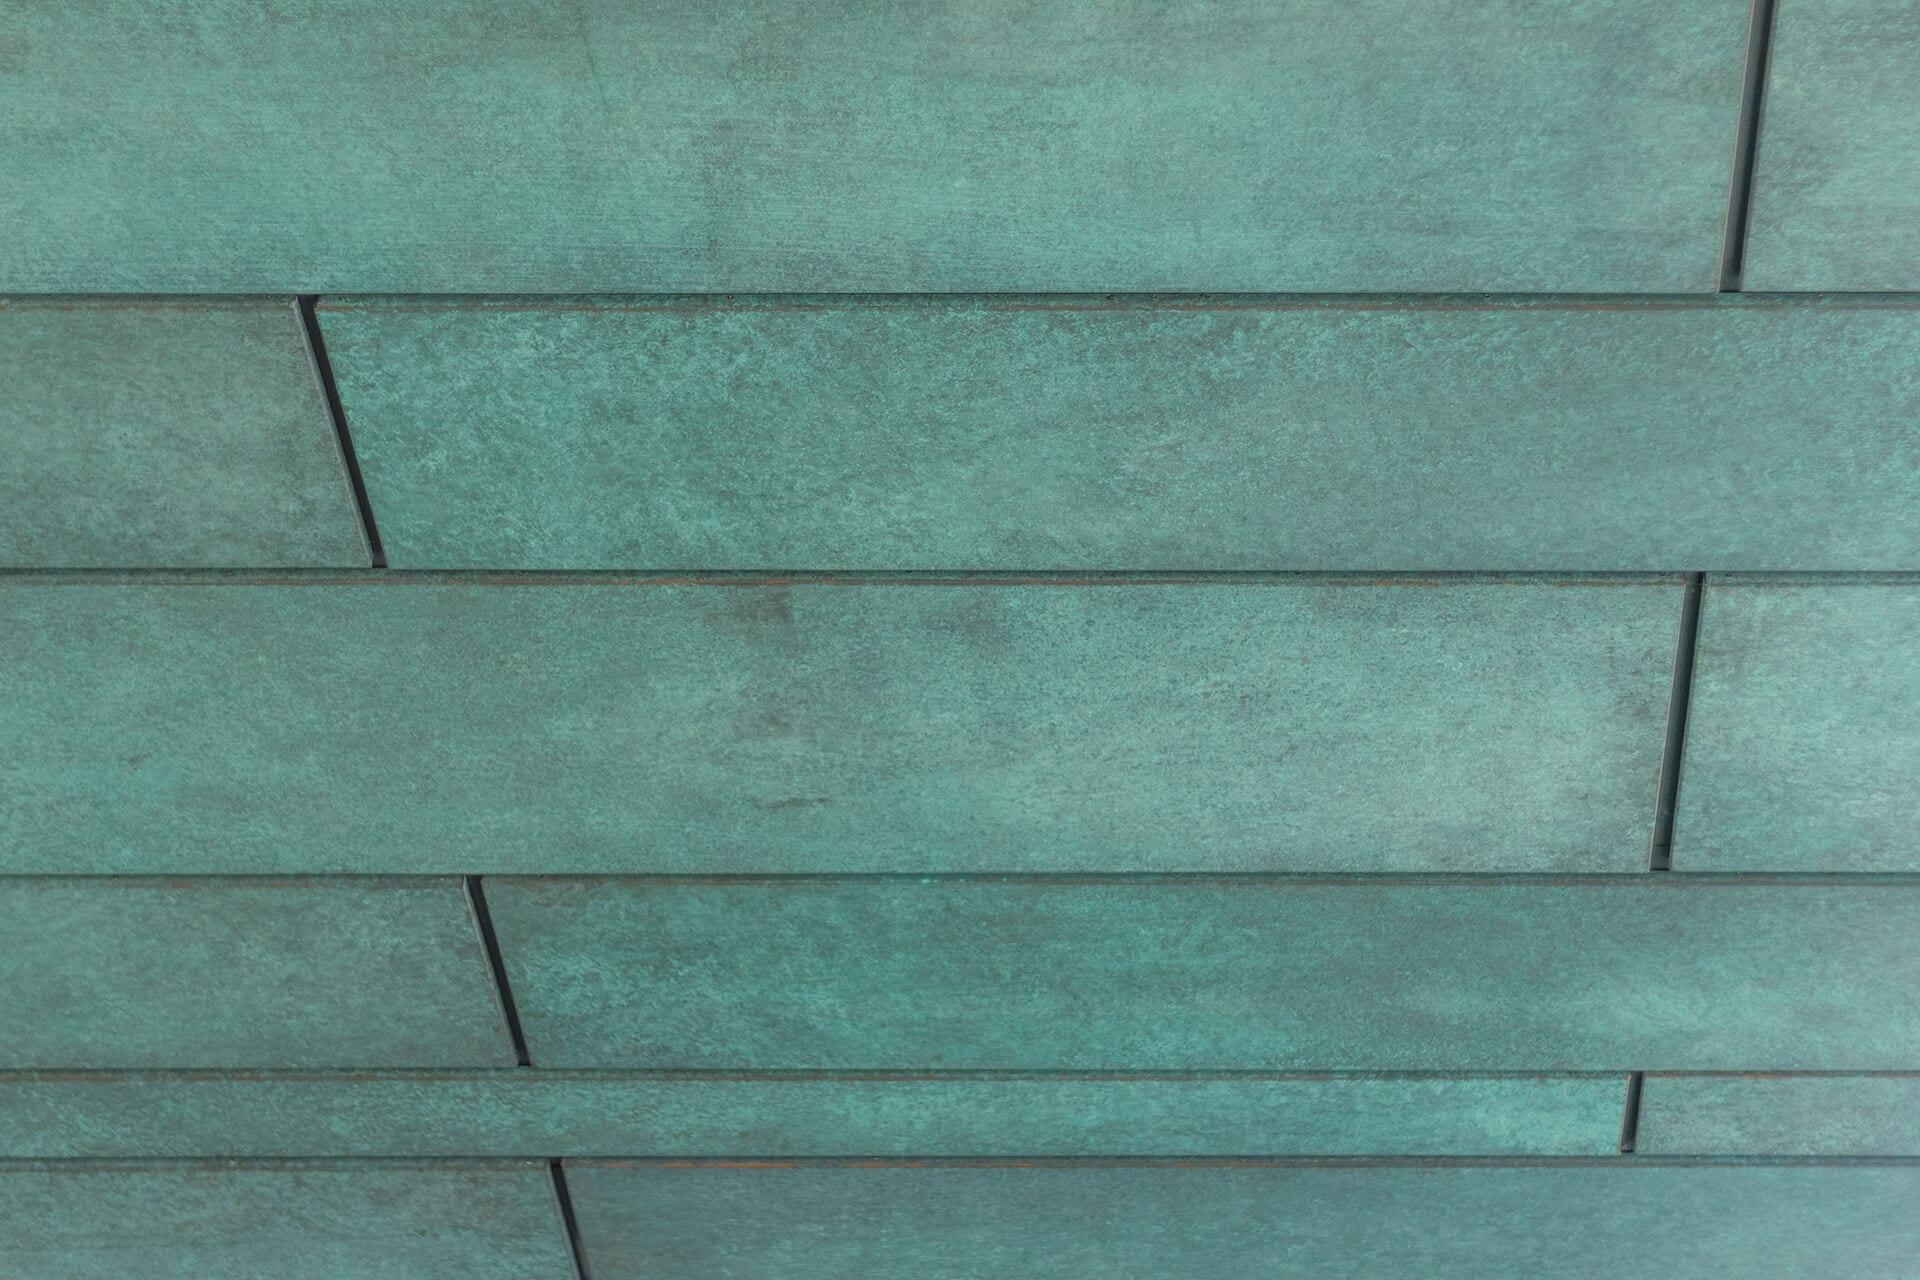 Columbus Museum of Art, detail of the custom copper soffit.